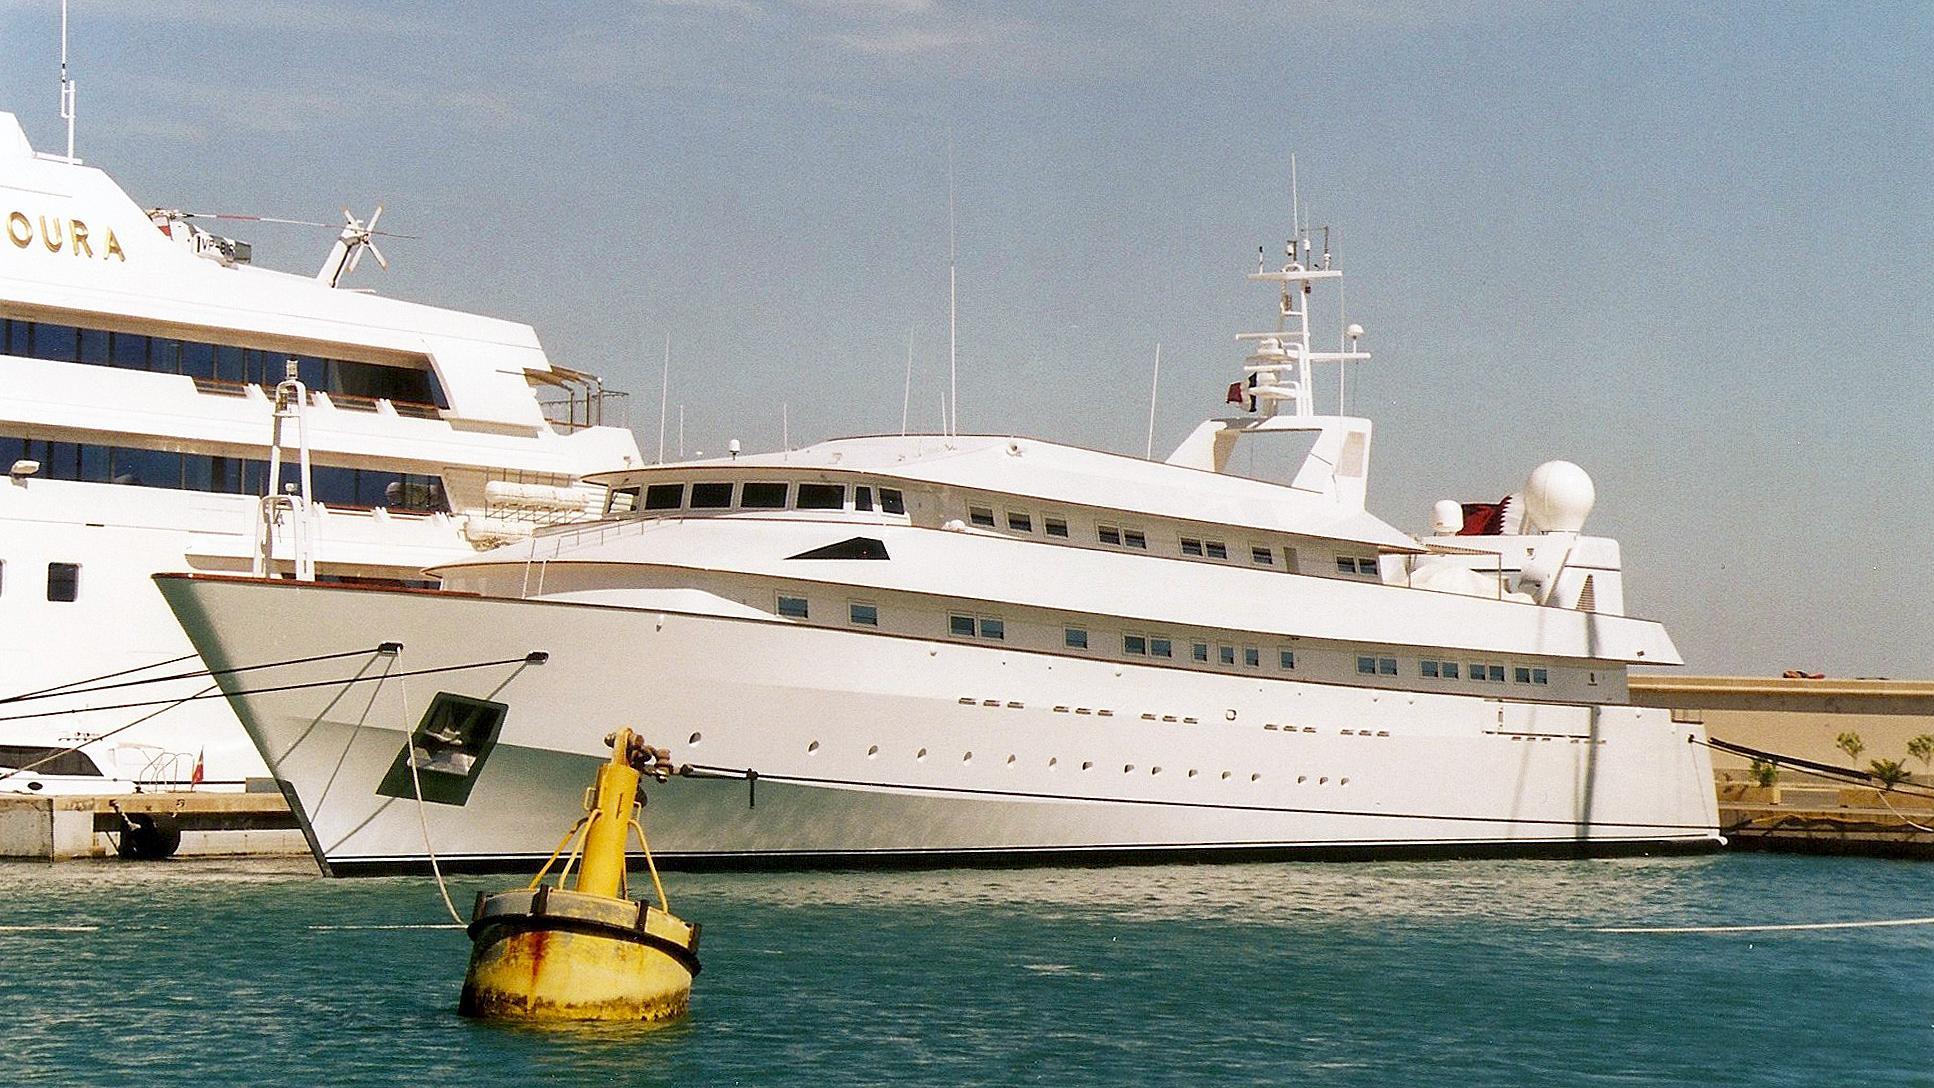 yaakun-motor-yacht-nicolini-1987-65m-half-profile